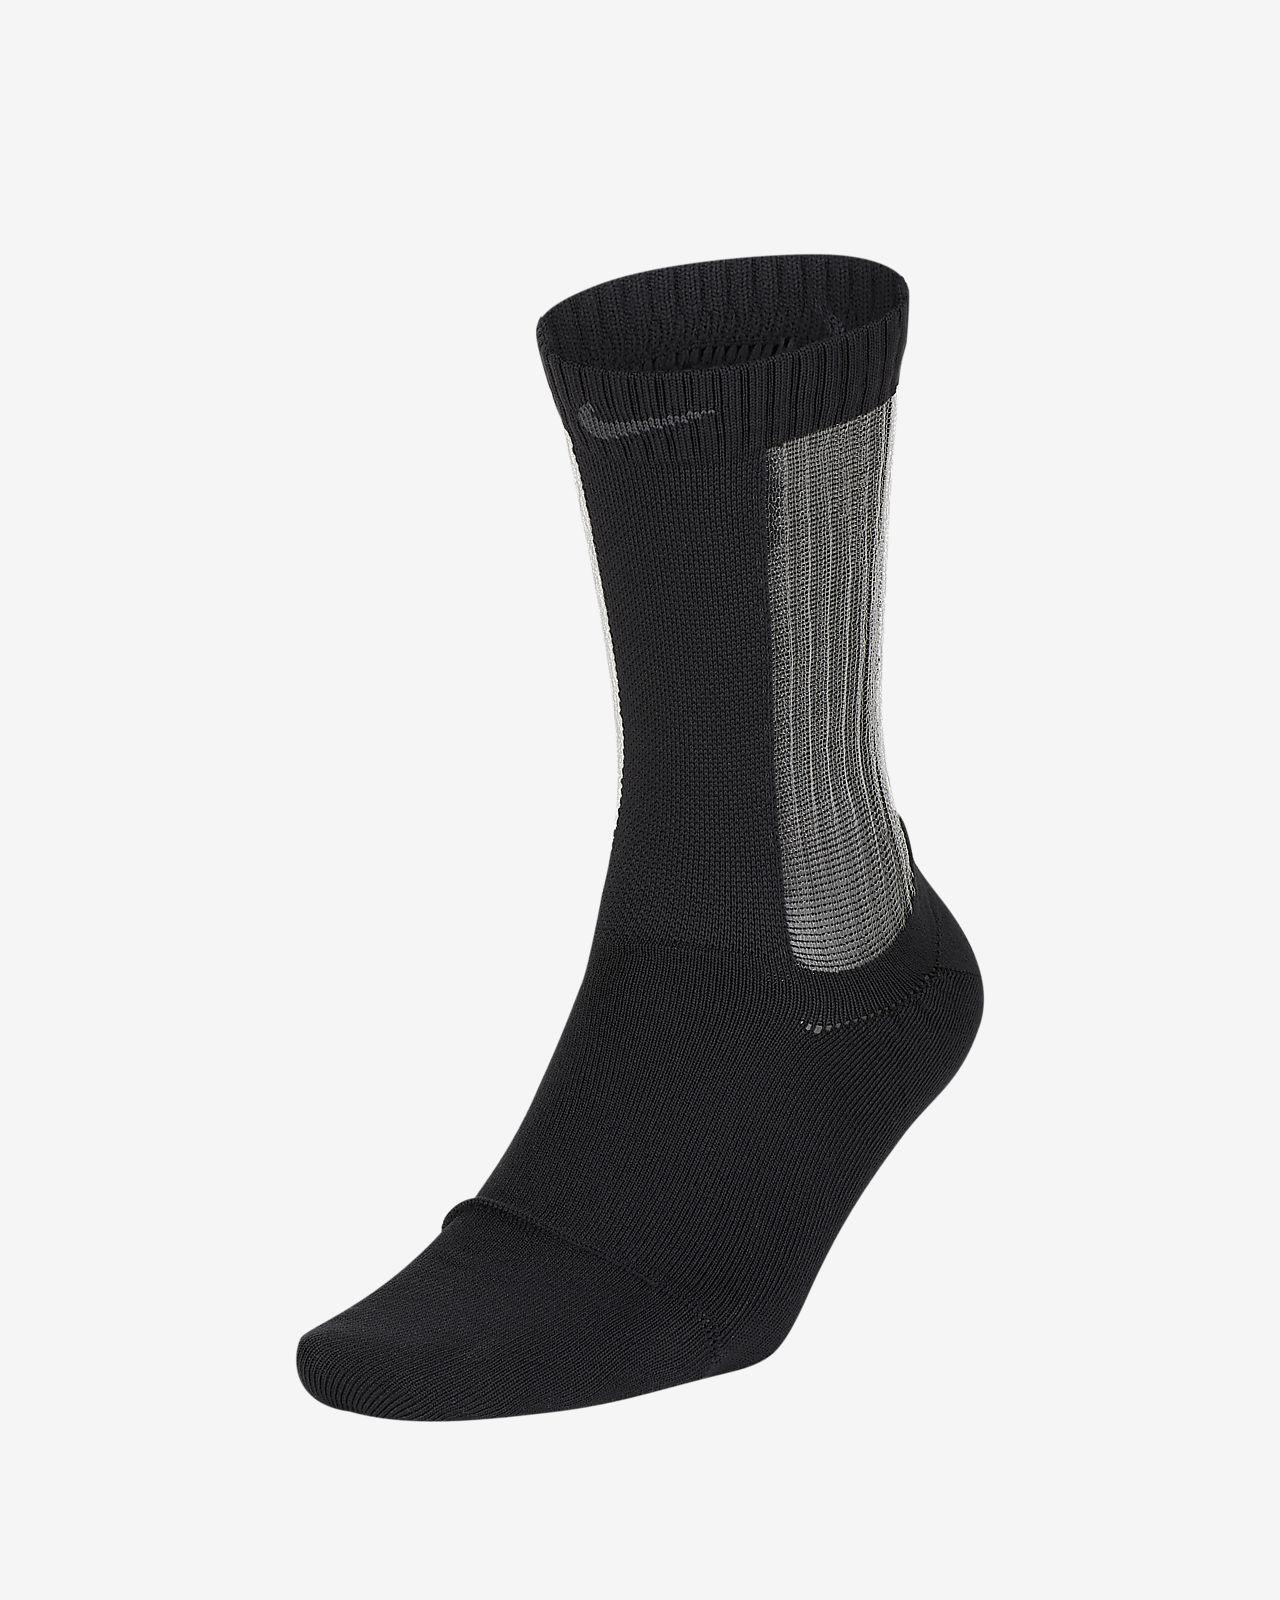 Dámské průsvitné kotníkové ponožky Nike Air